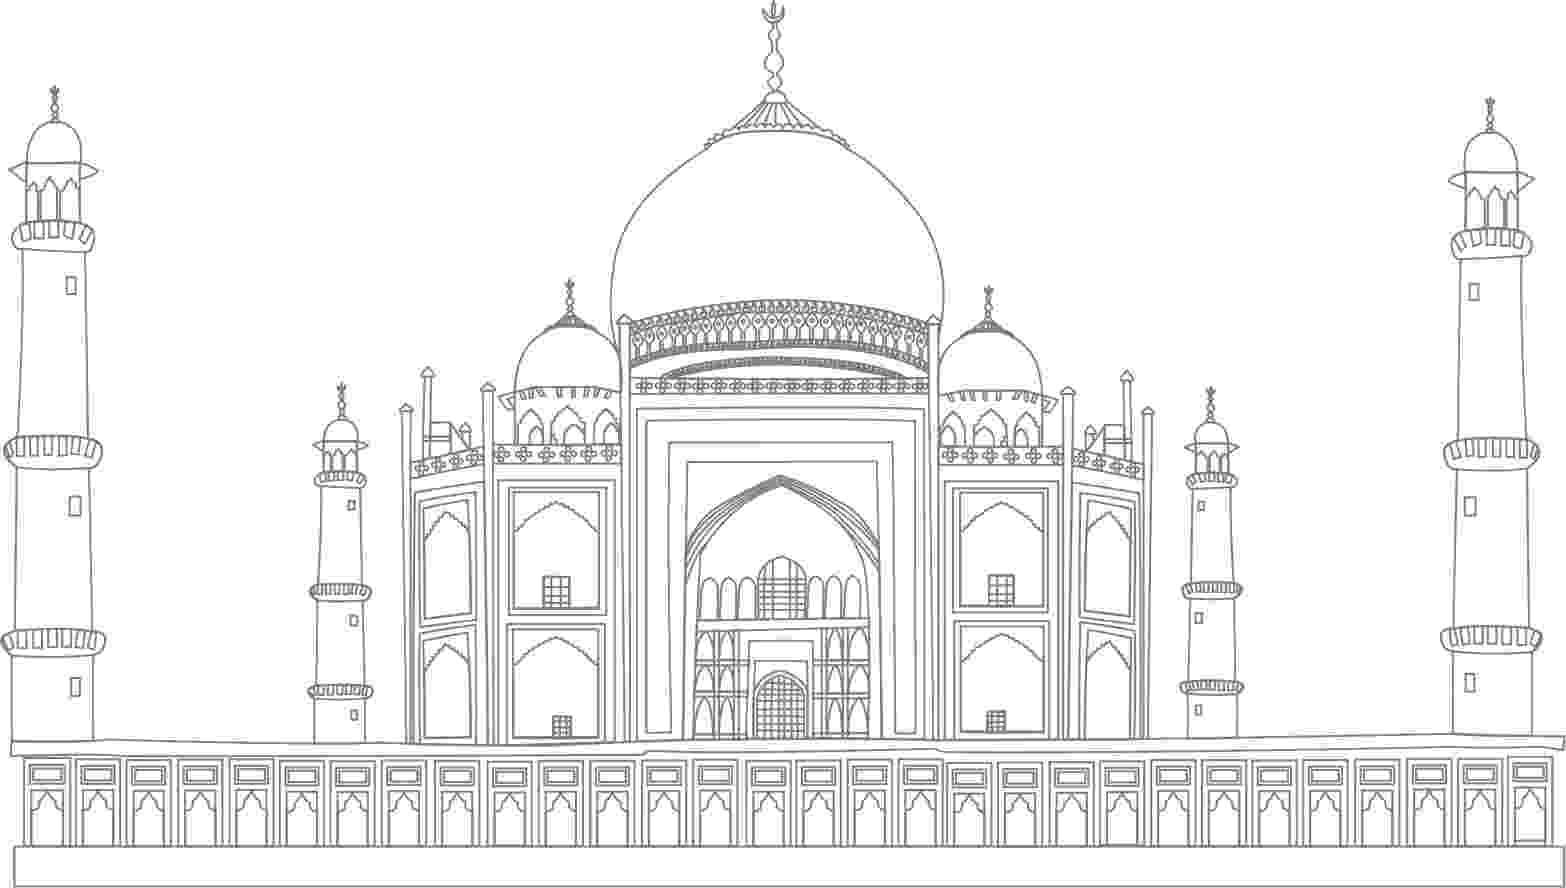 pictures of taj mahal to draw taj mahal drawing stock illustrations 342 taj mahal taj to mahal pictures draw of